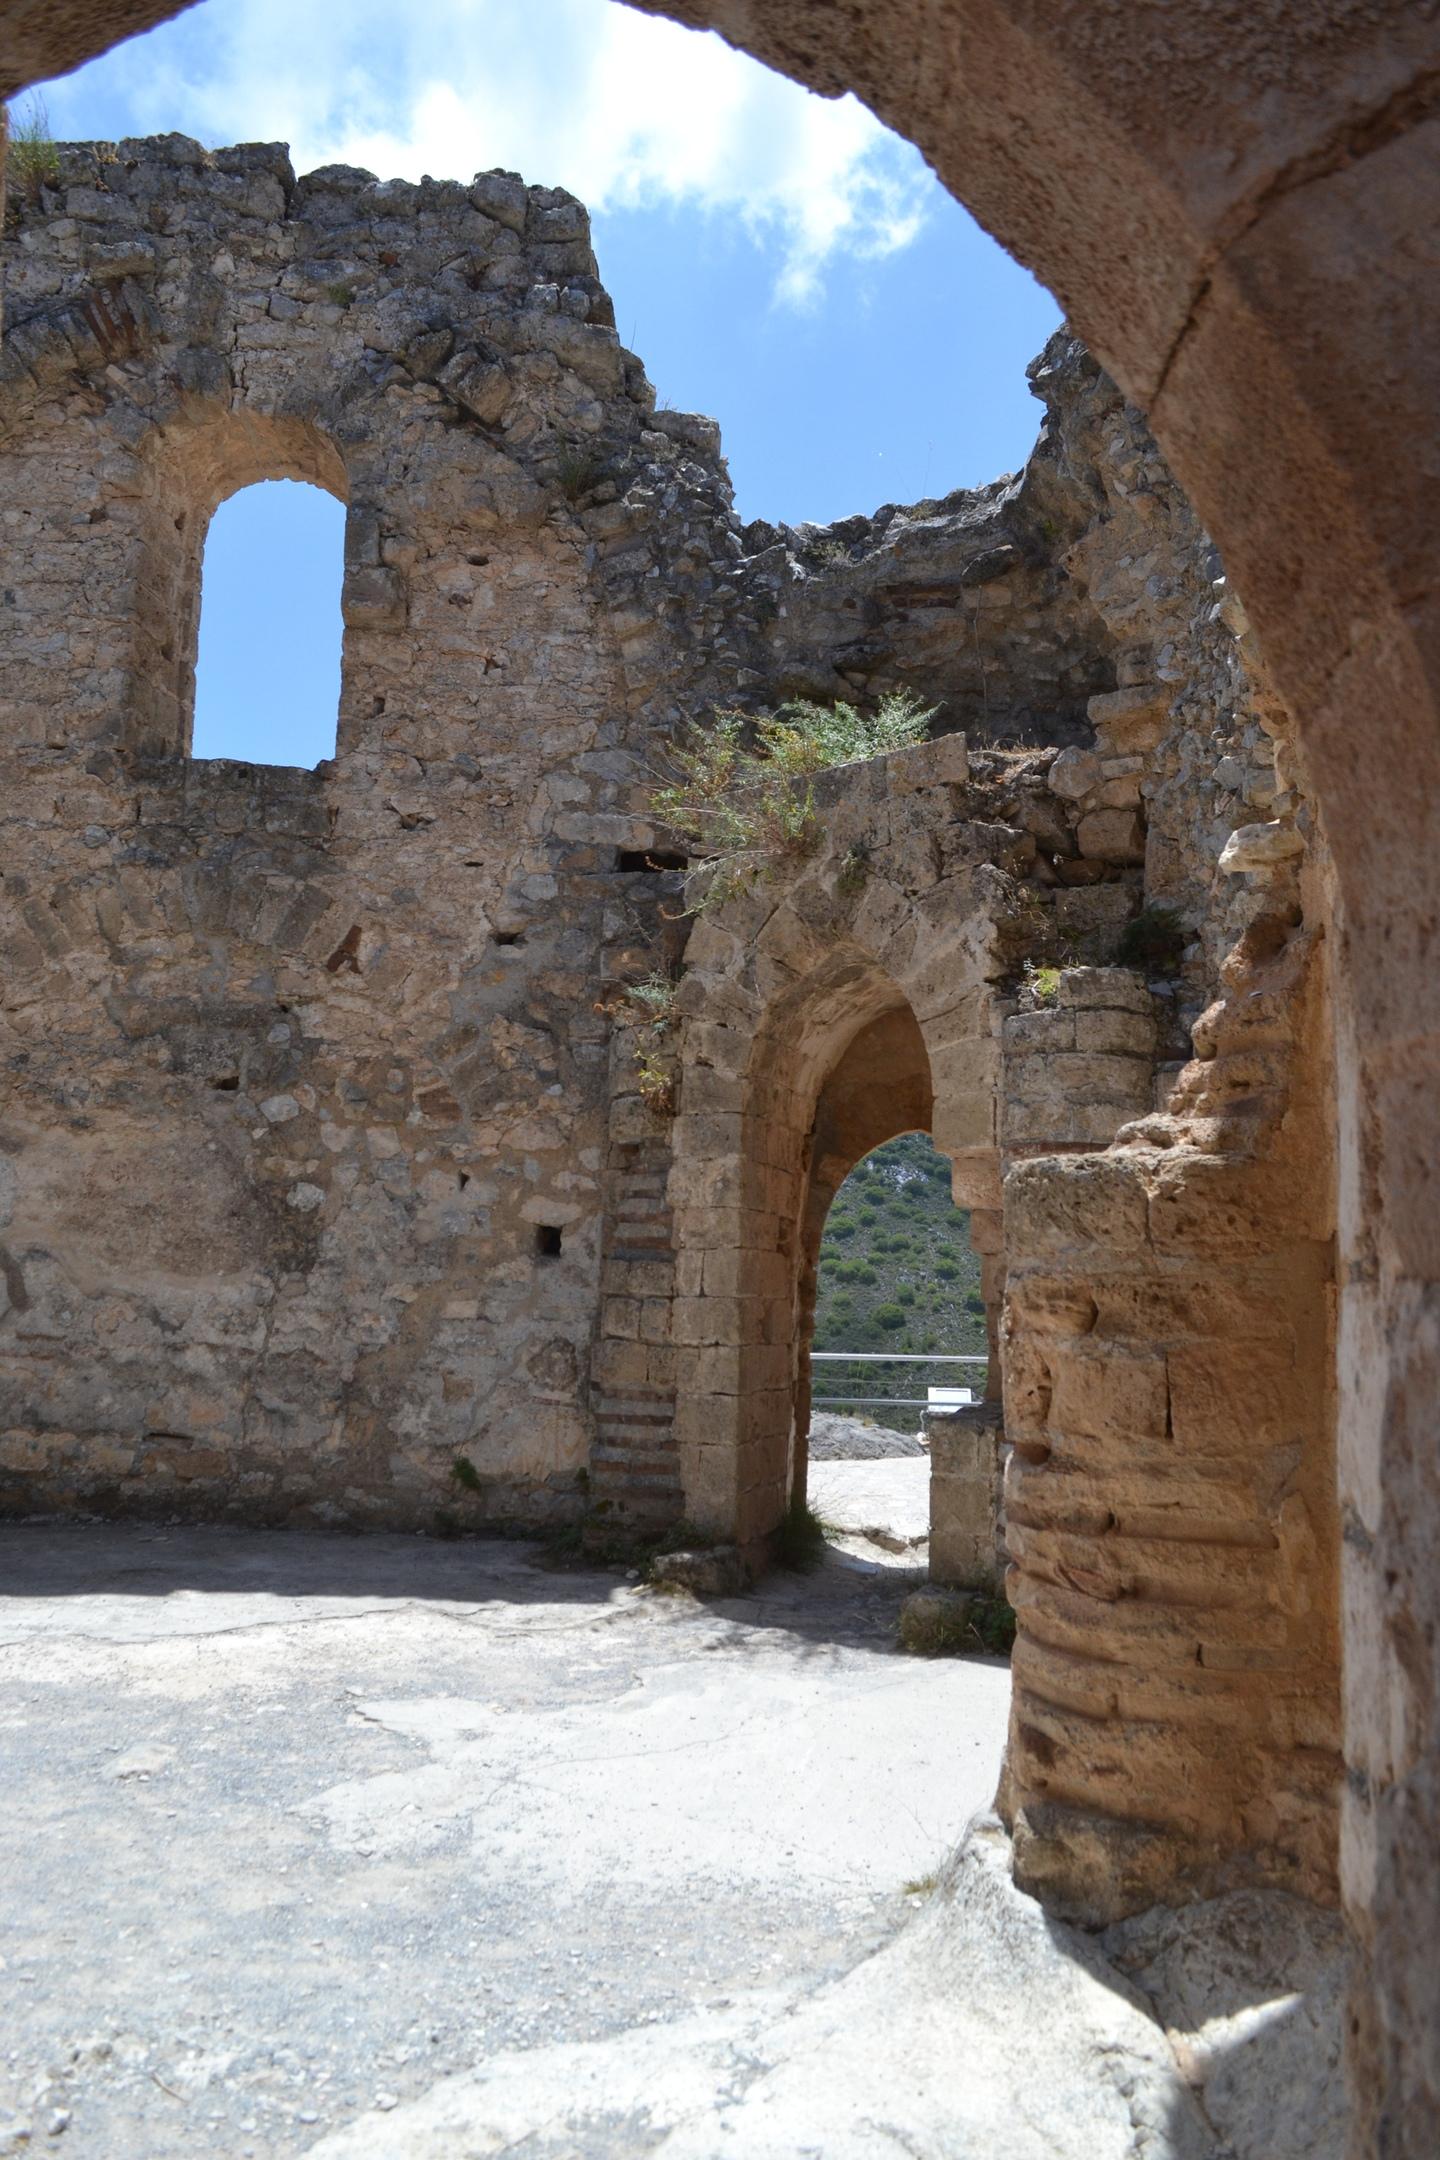 Северный Кипр. Замок Святого Иллариона. (фото). - Страница 2 YACxrS5Z8dA